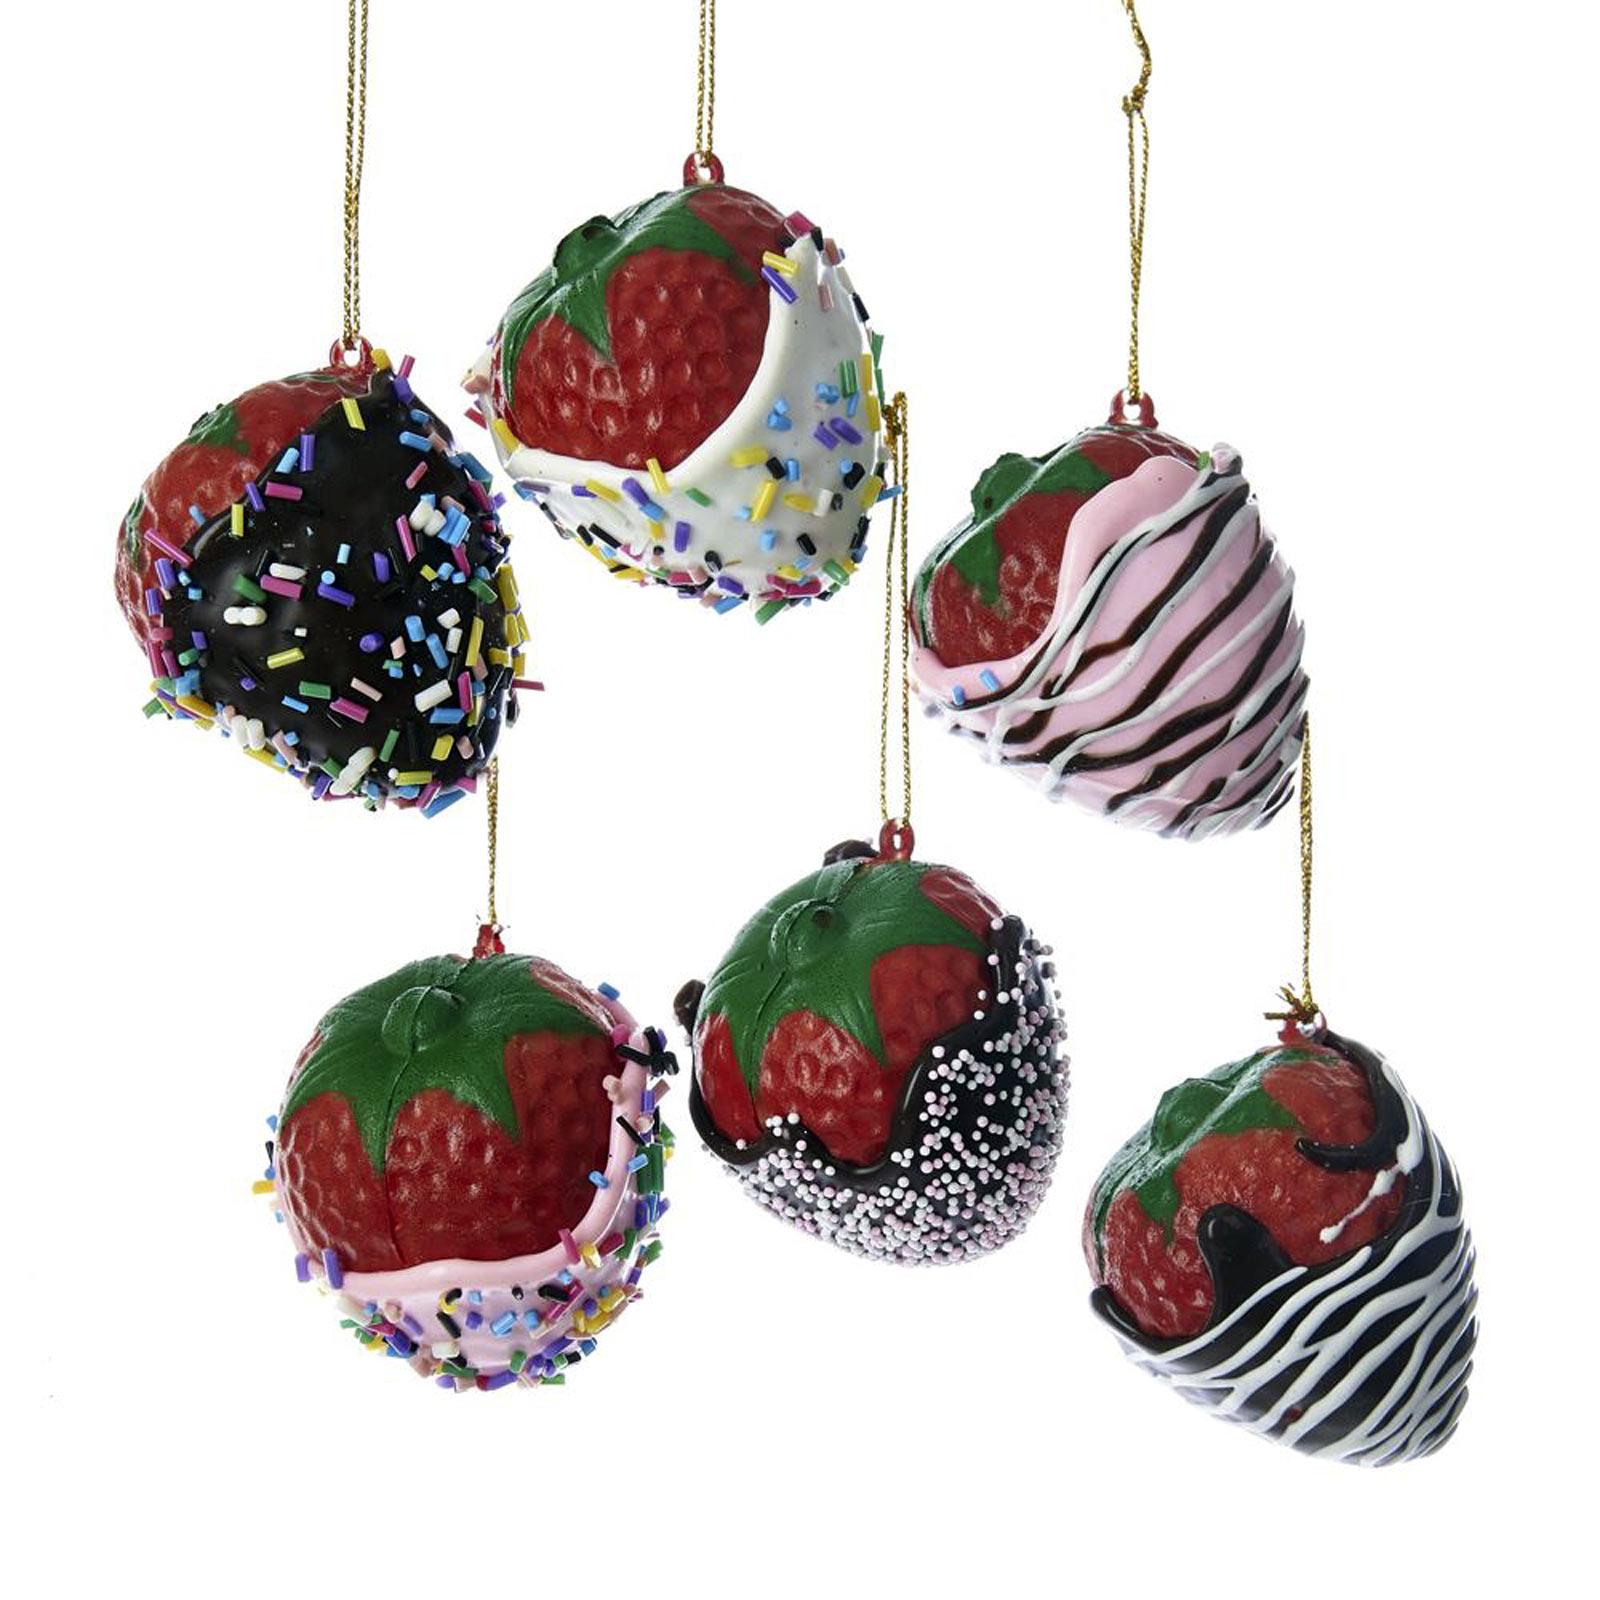 Christmas Decorations Santa Clarita Ca: Set/6 Kurt Adler Realistic Chocolate Strawberry Ornaments